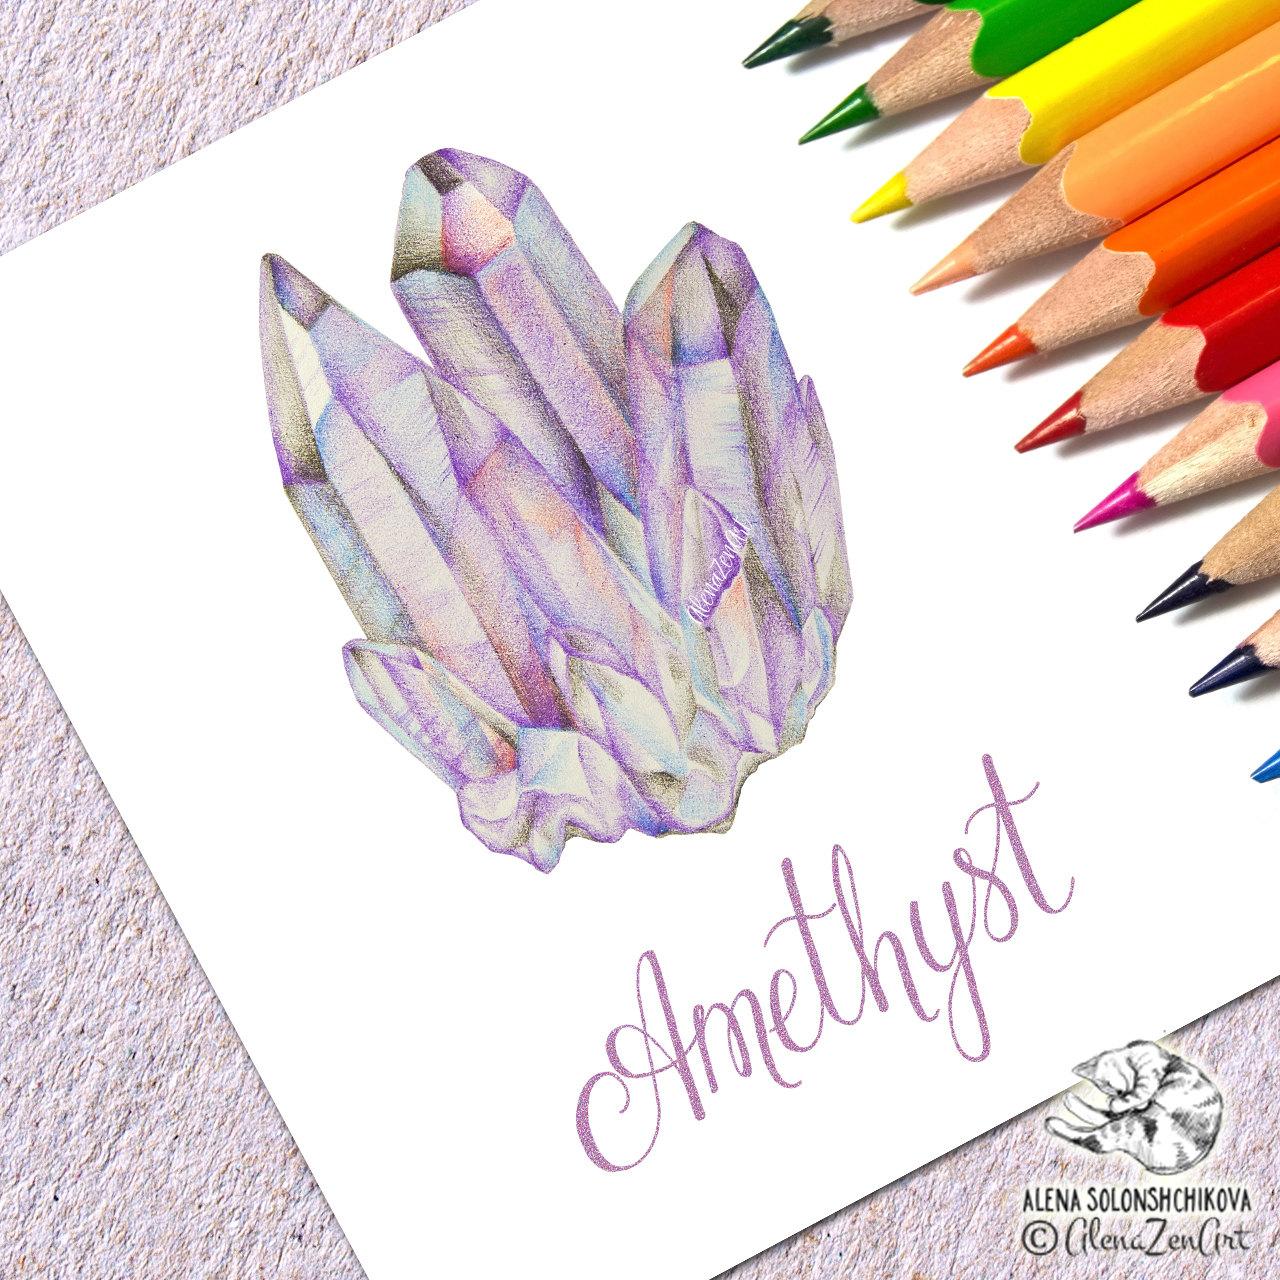 Healing clipart magic hand 8x10 download Art Crown Chakra